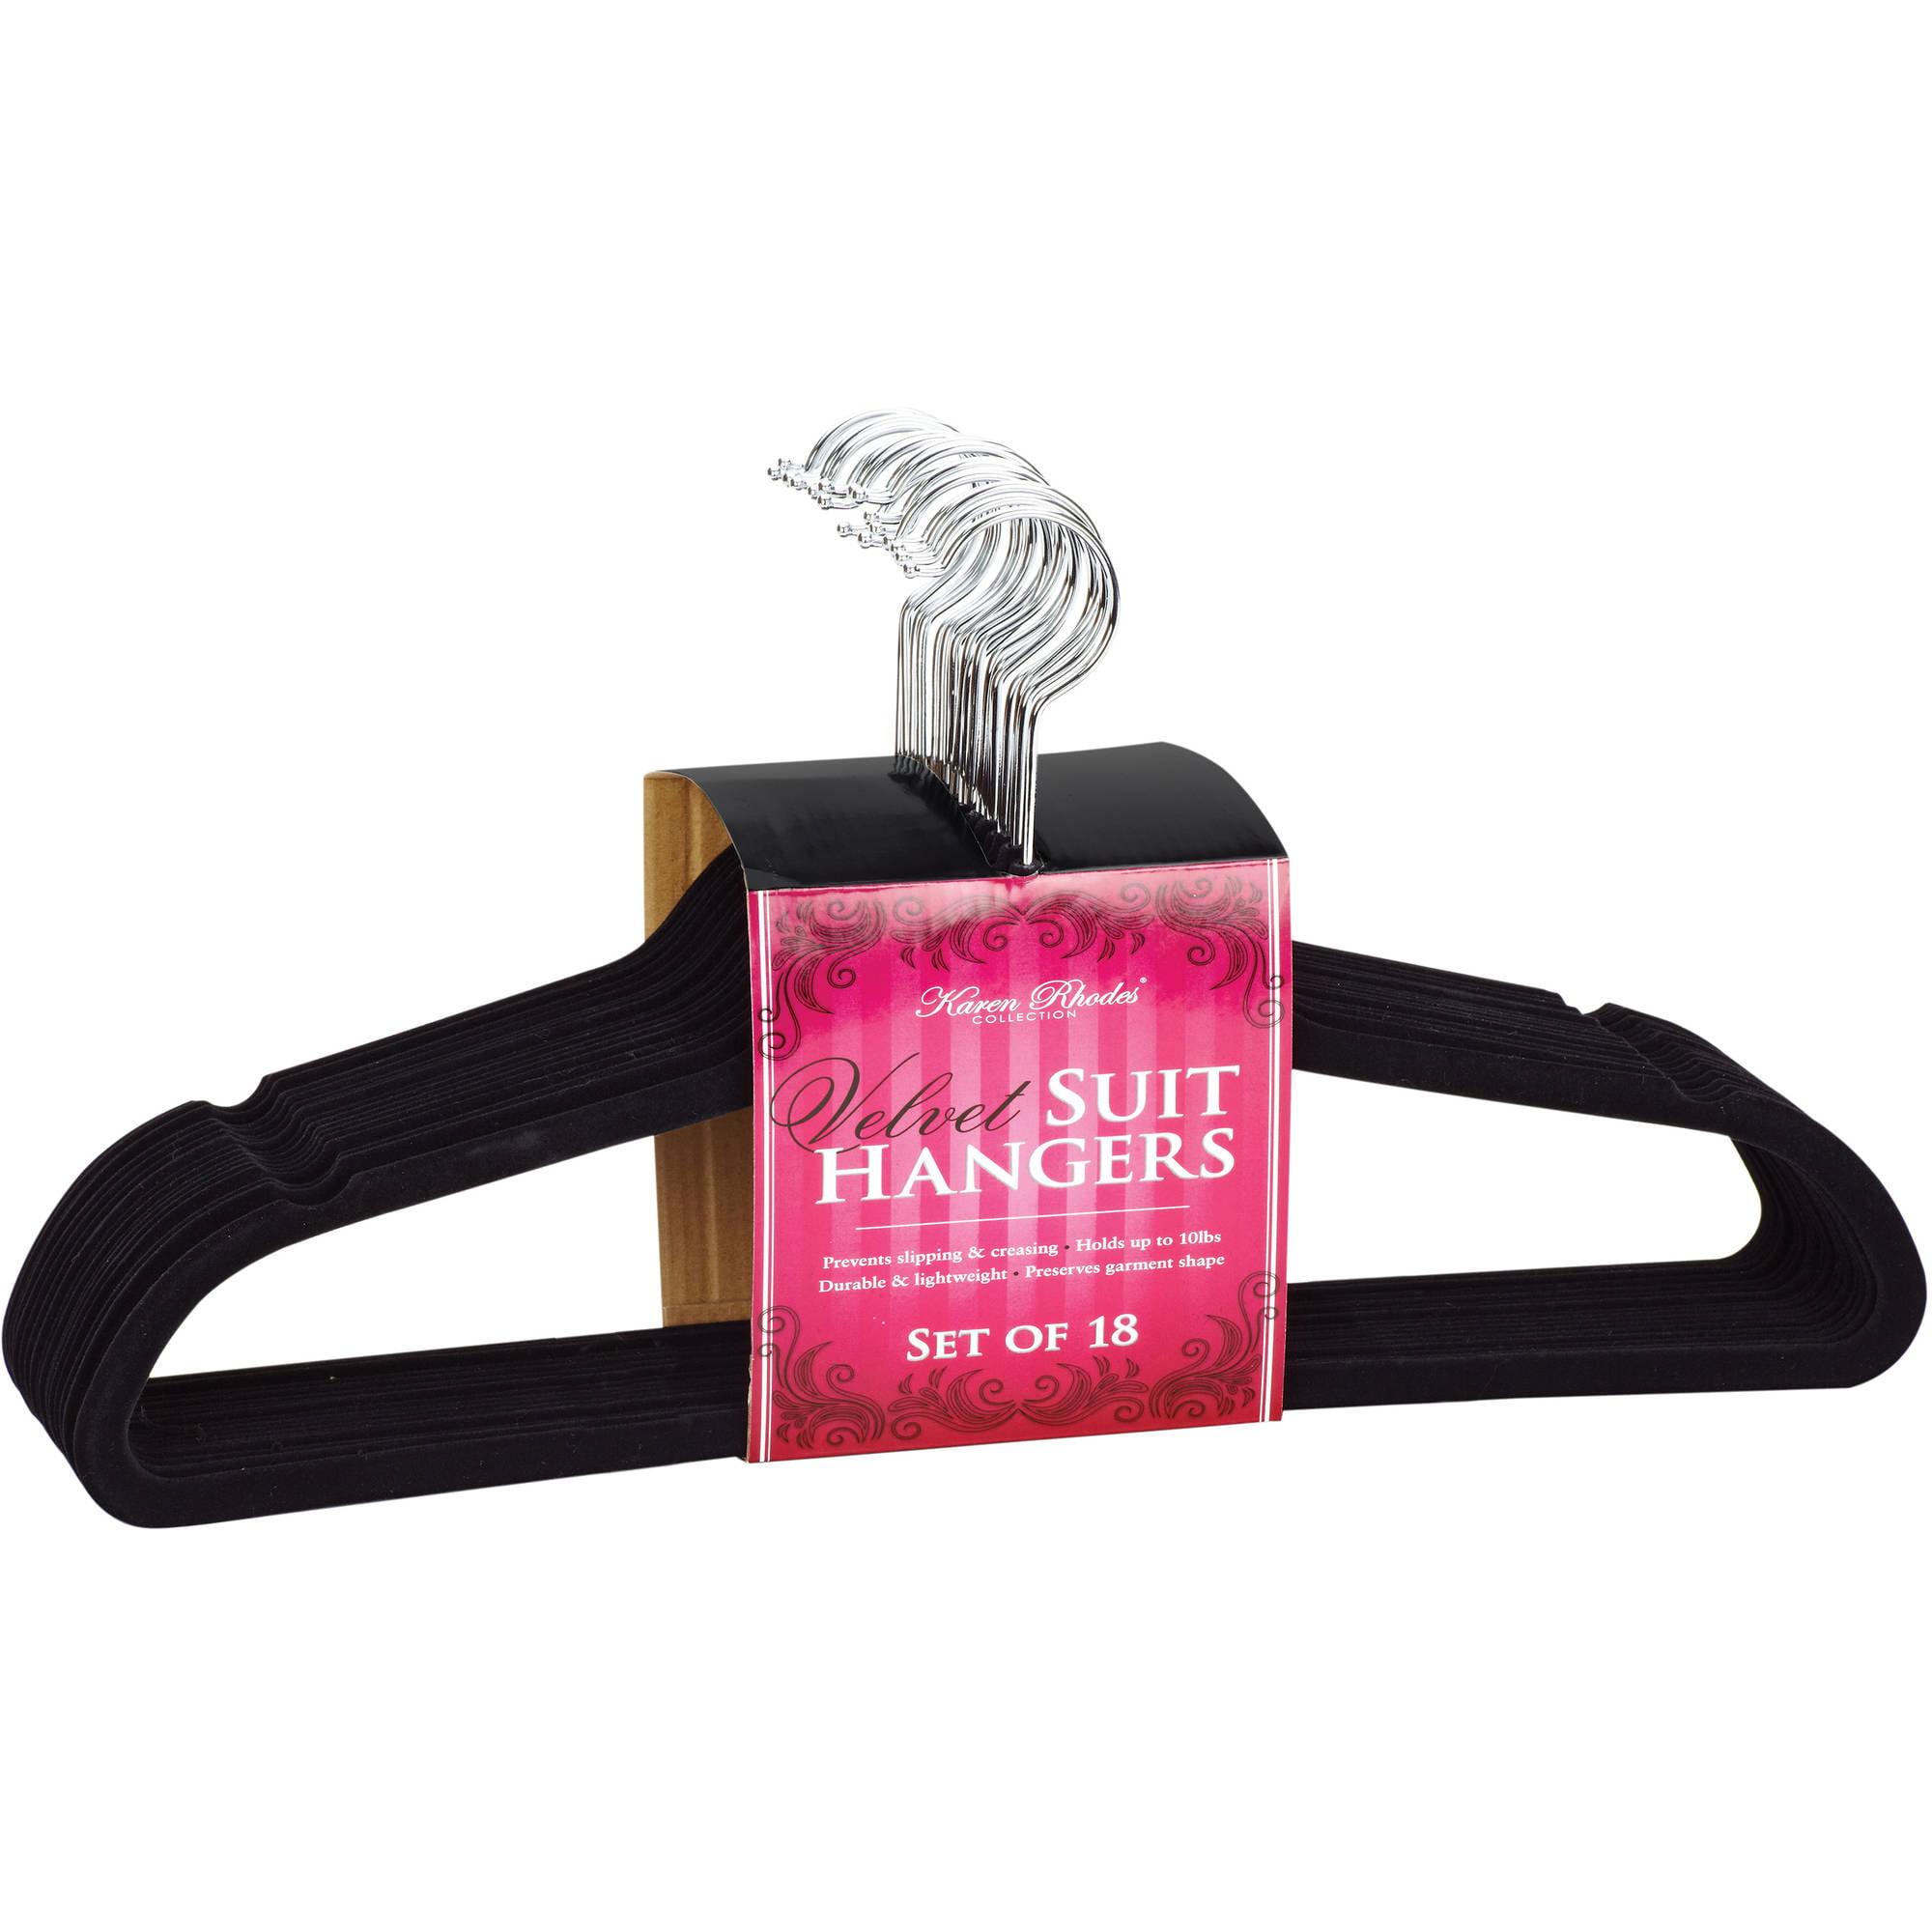 Simplify Velvet Suit Hangers, 18 Pack